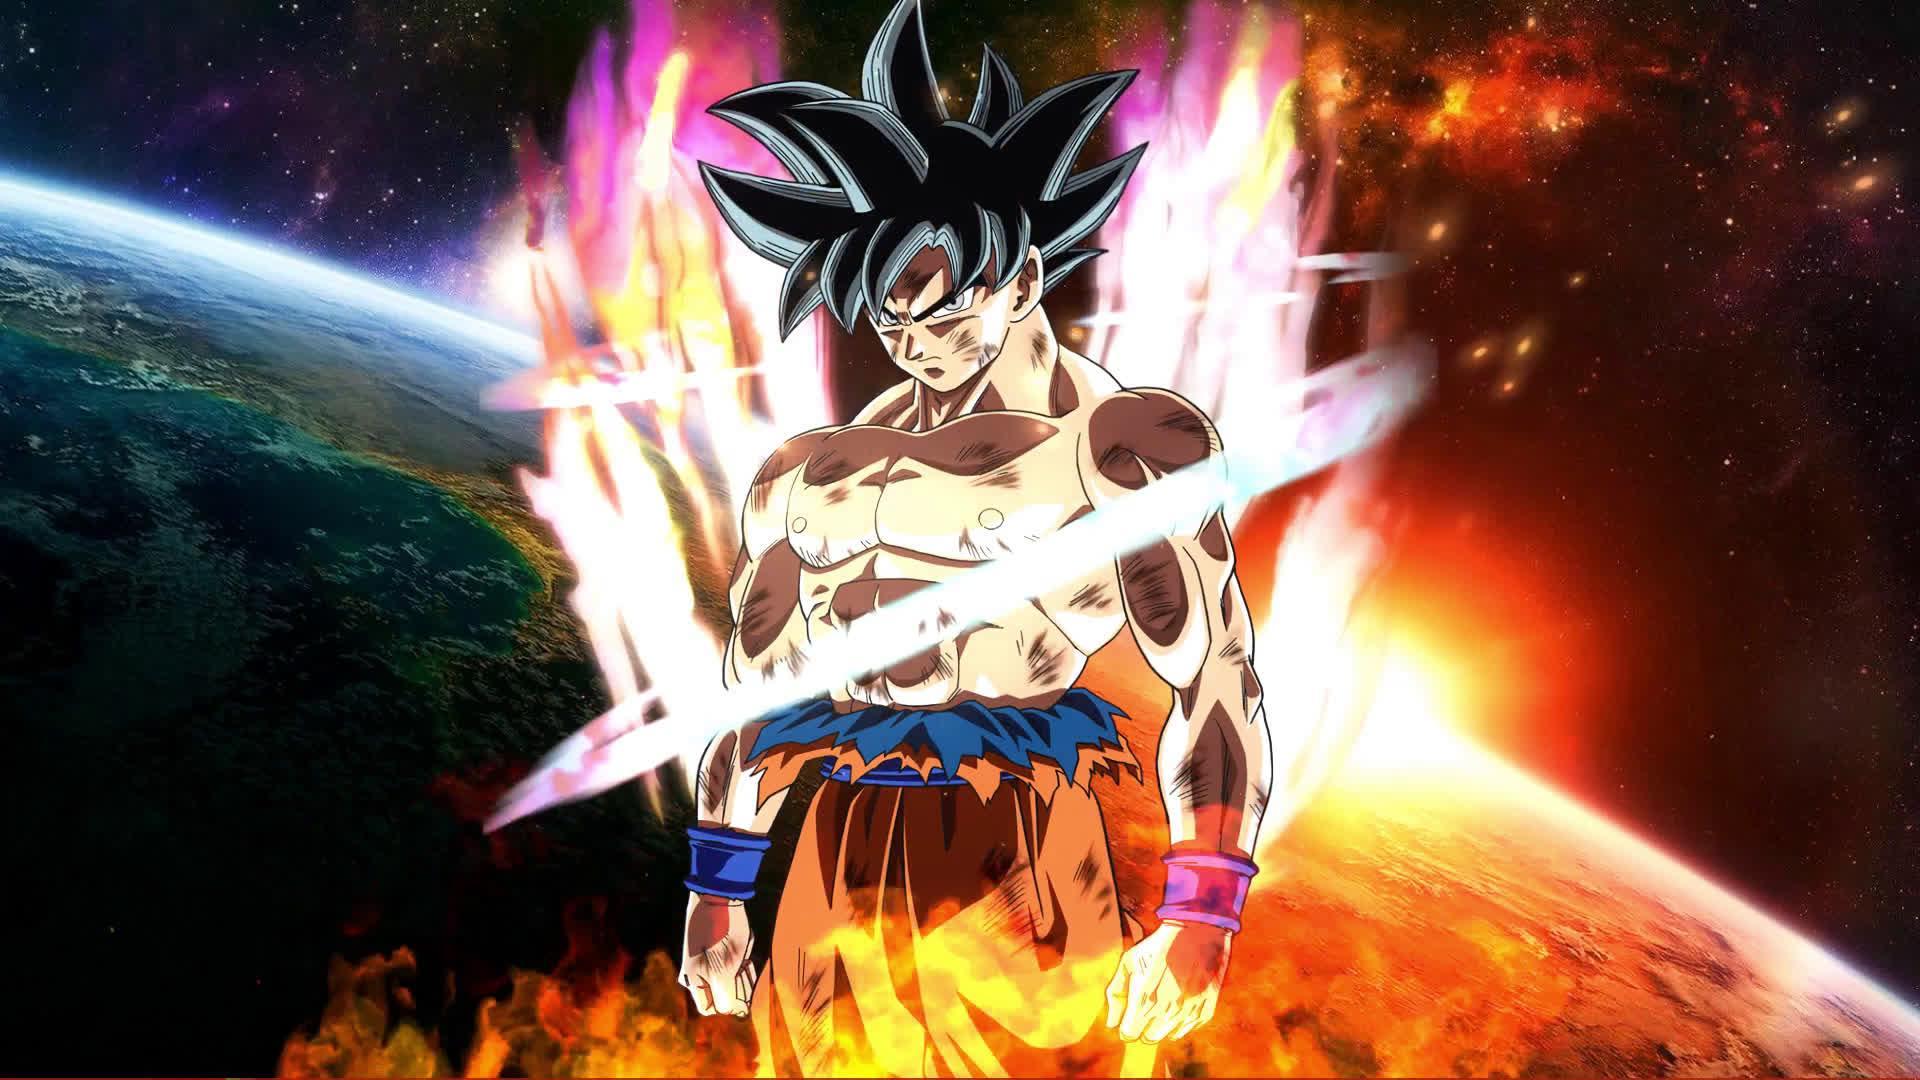 "1080x1920 Dragon Ball Z   Anime iPhone wallpapers   Goku   Pinterest   Dragon ..."">"